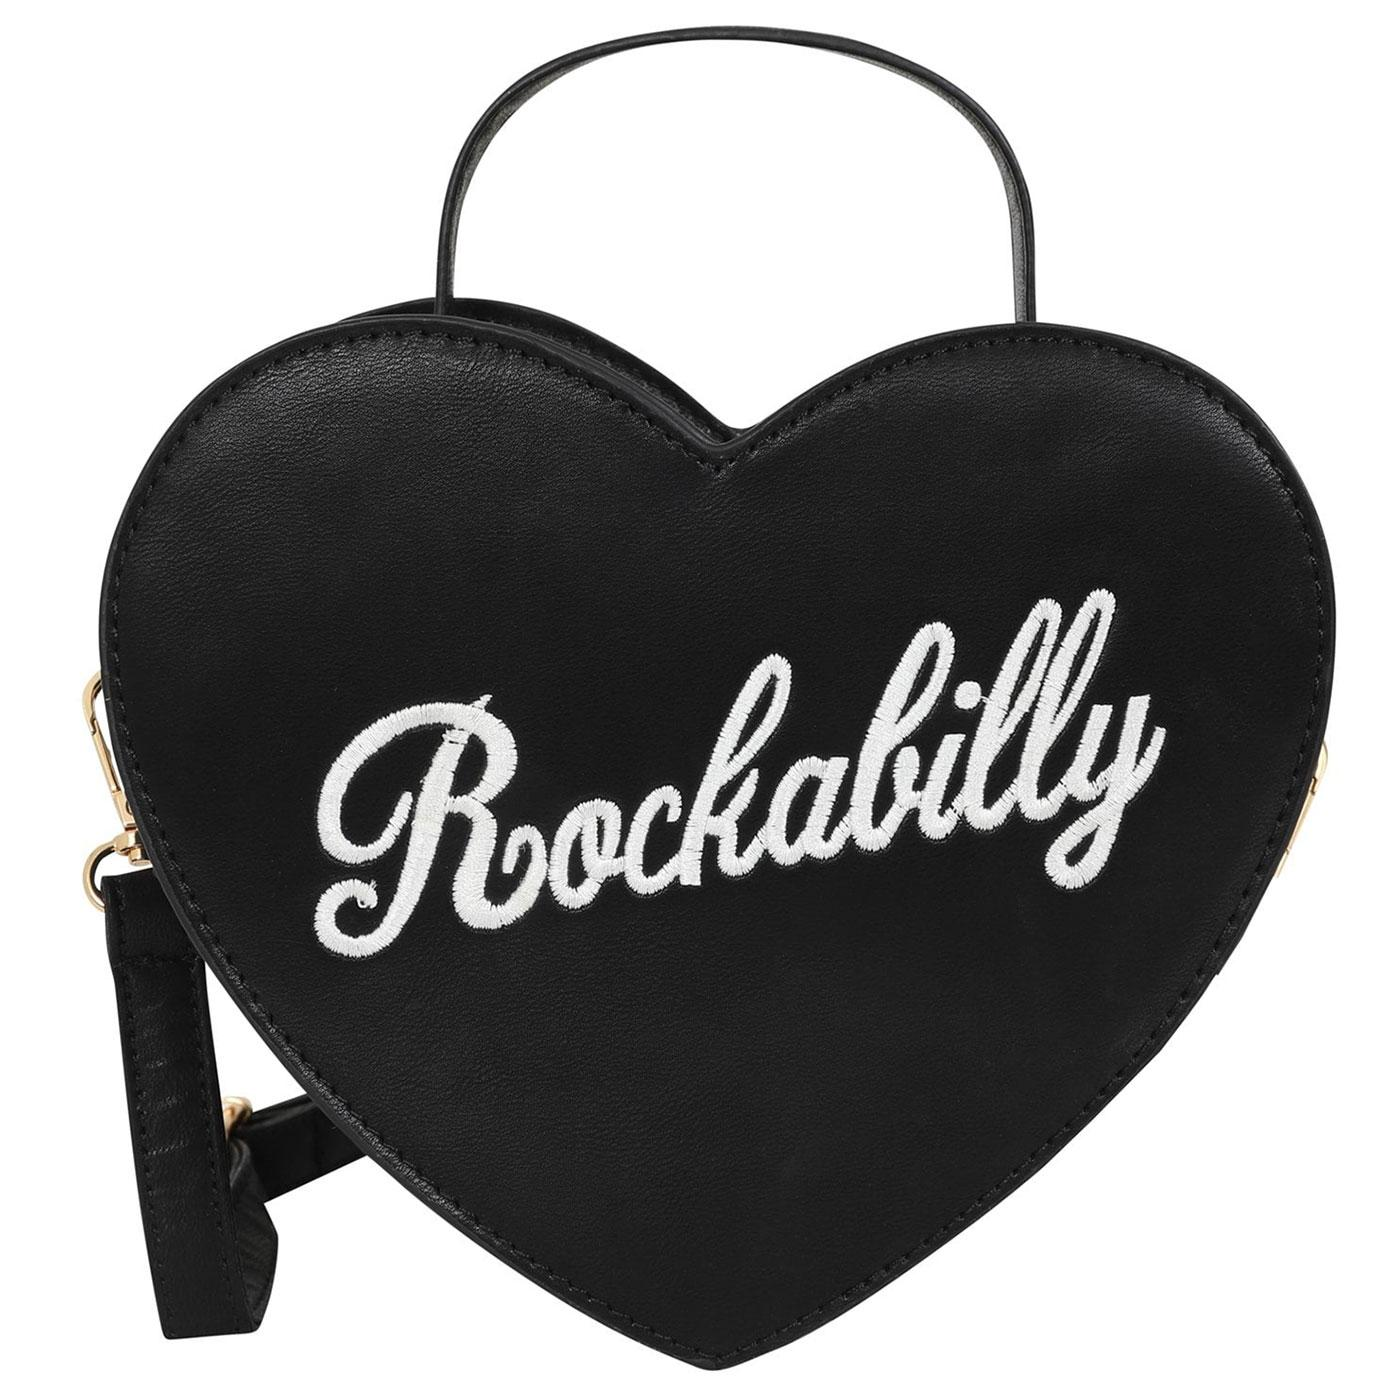 Bina LULU HUN Retro 50s Rockabilly Heart-Shape Bag